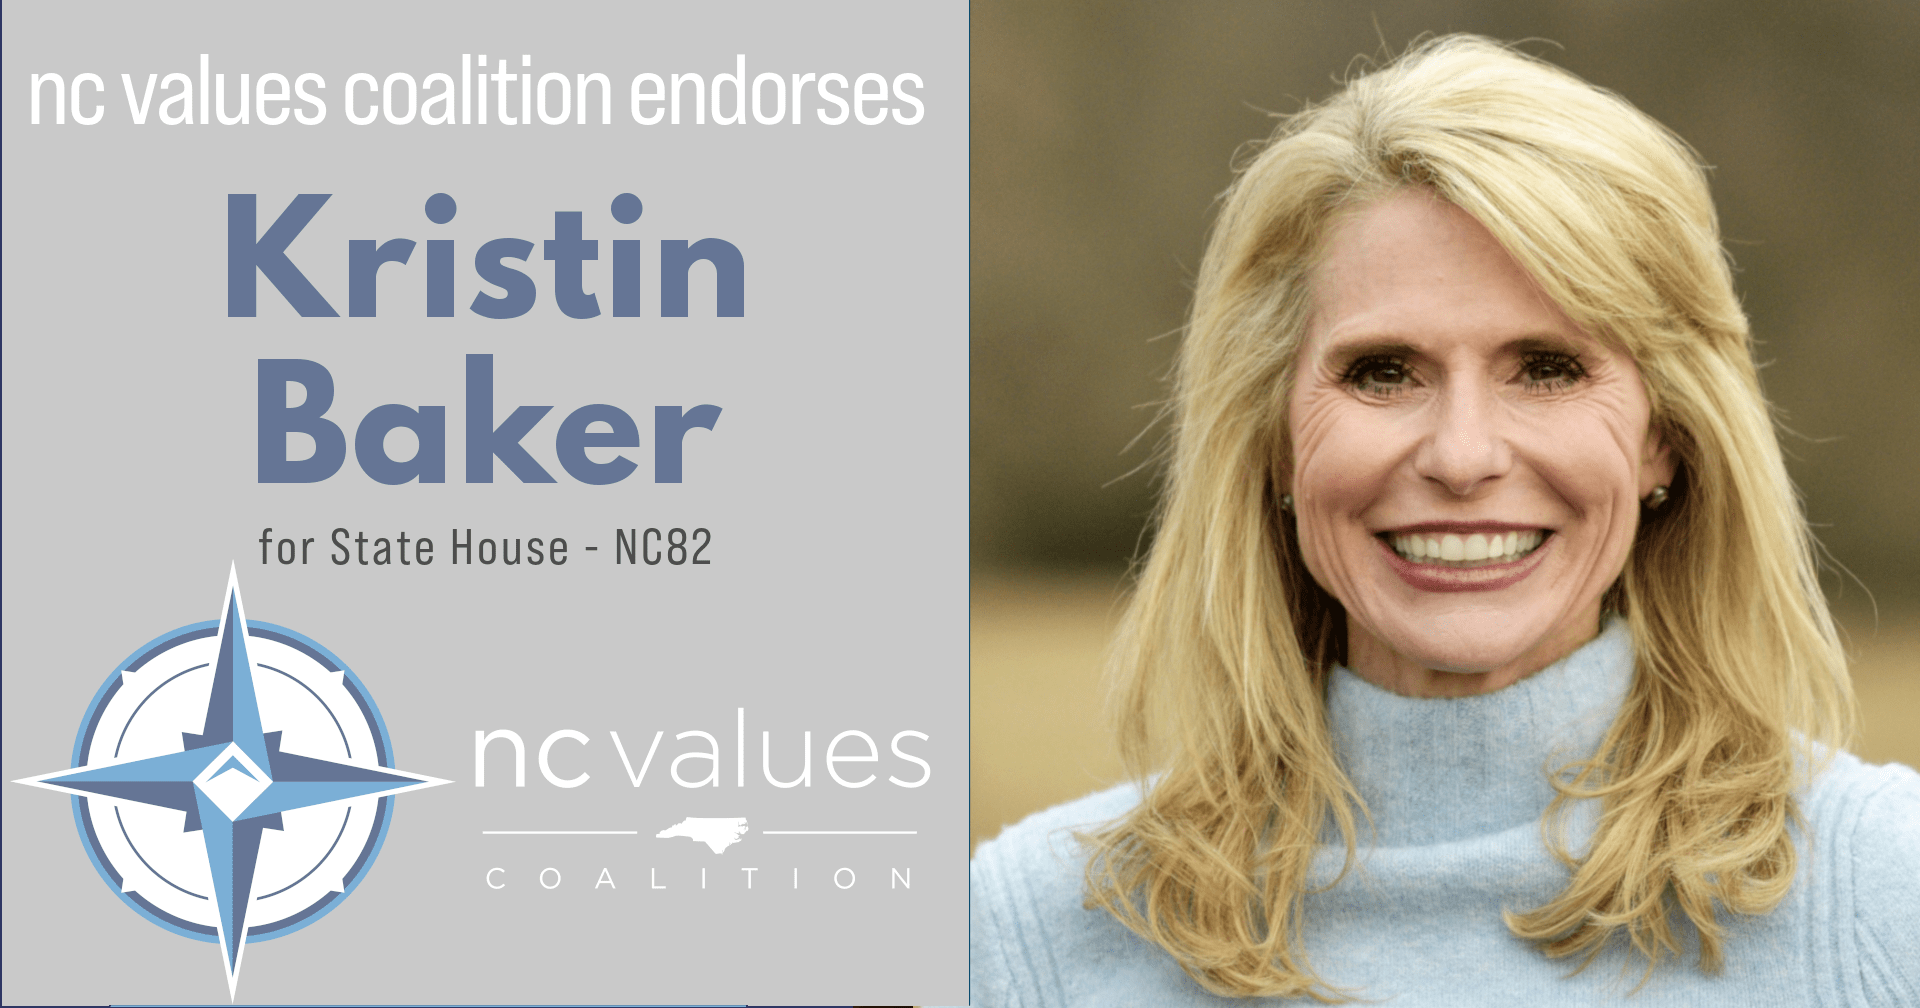 Kristin Baker for NC State House